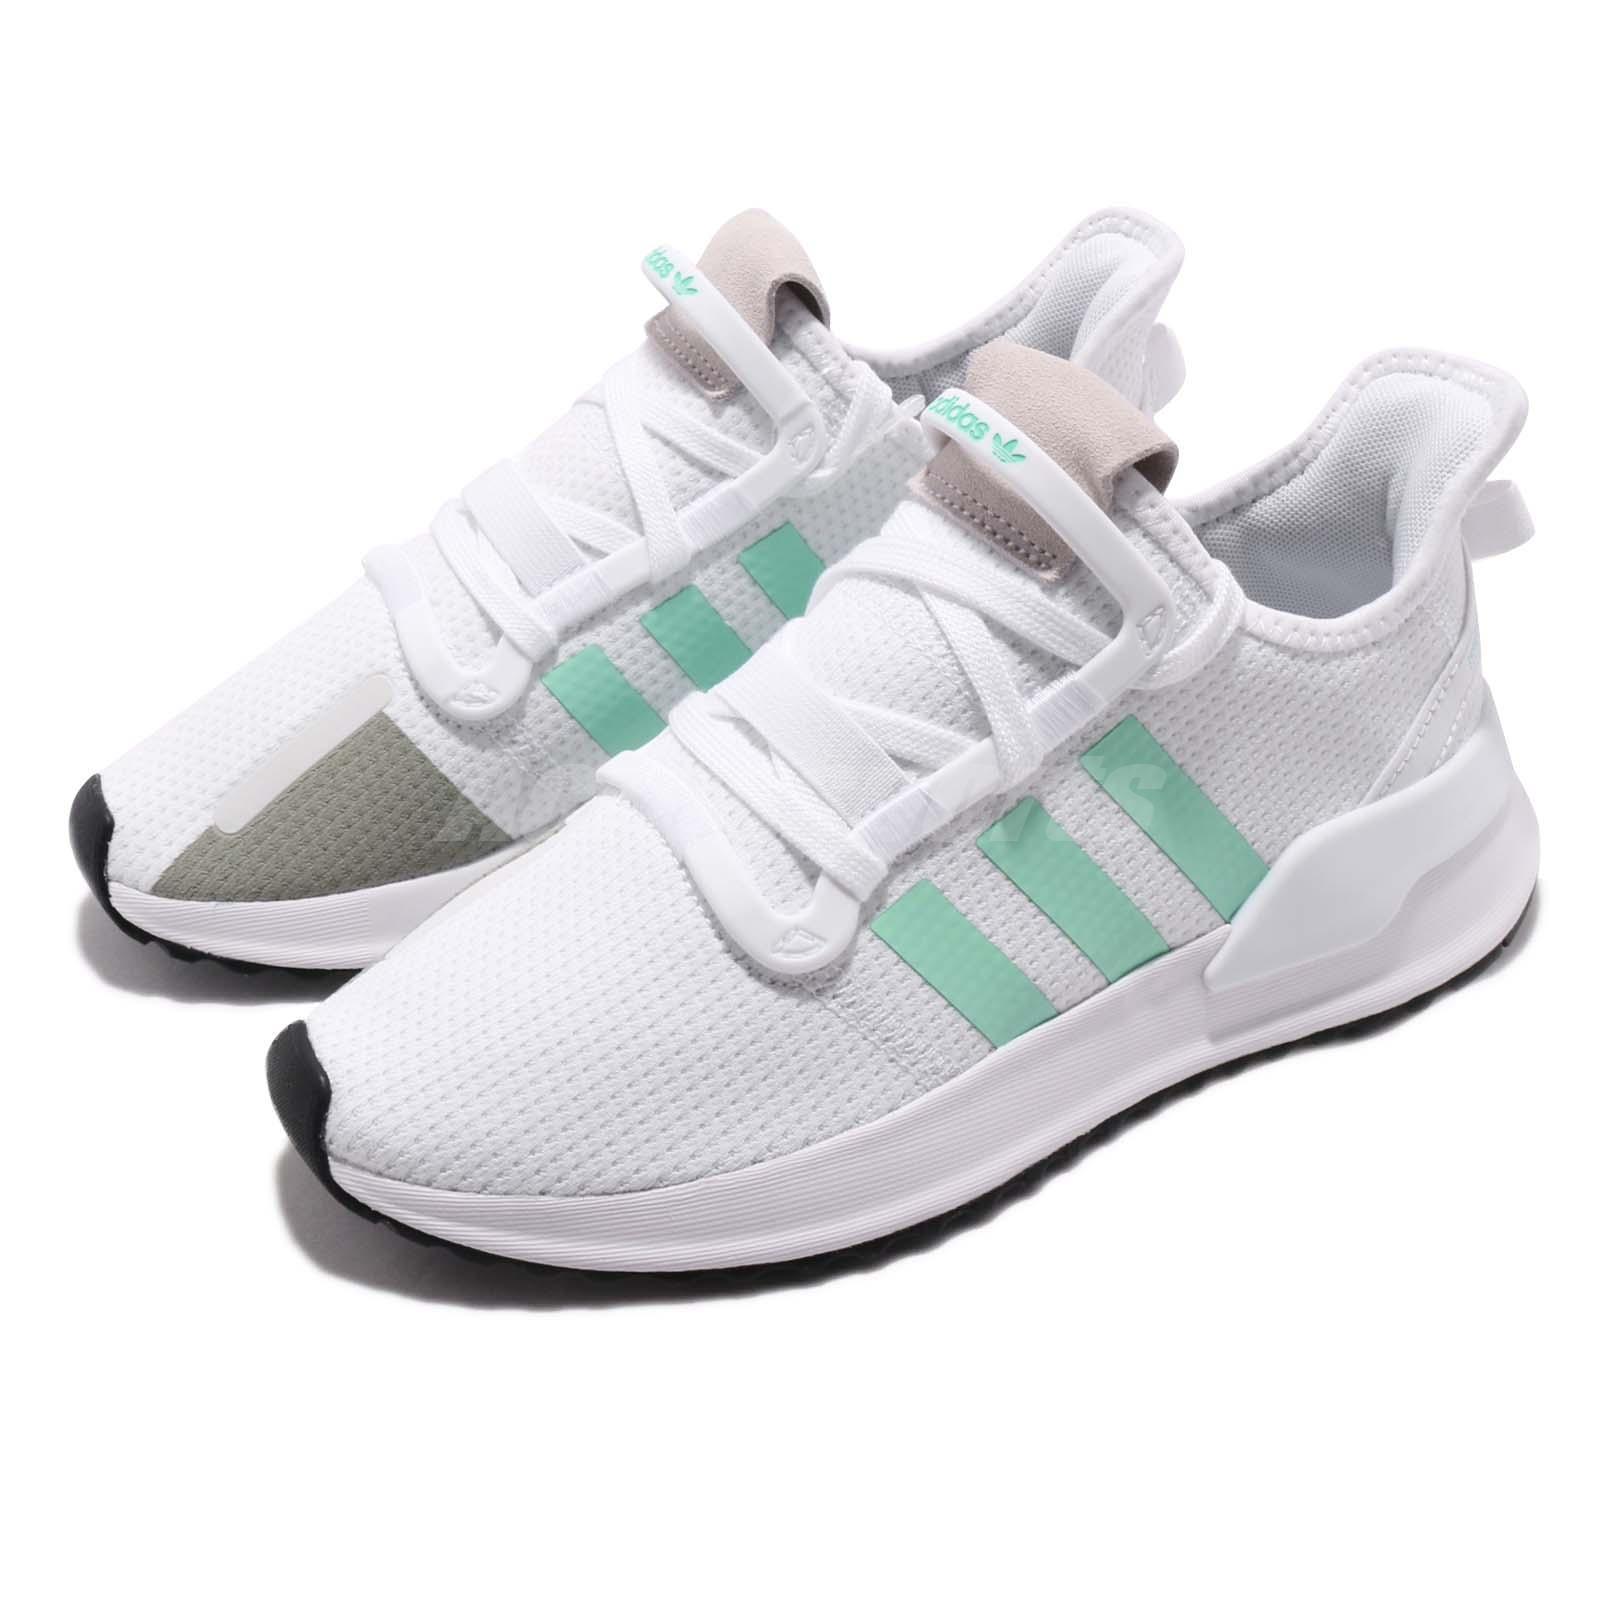 Details about adidas Originals U_Path Run W White Clear Mint Women Running  Shoe Sneaker G27649